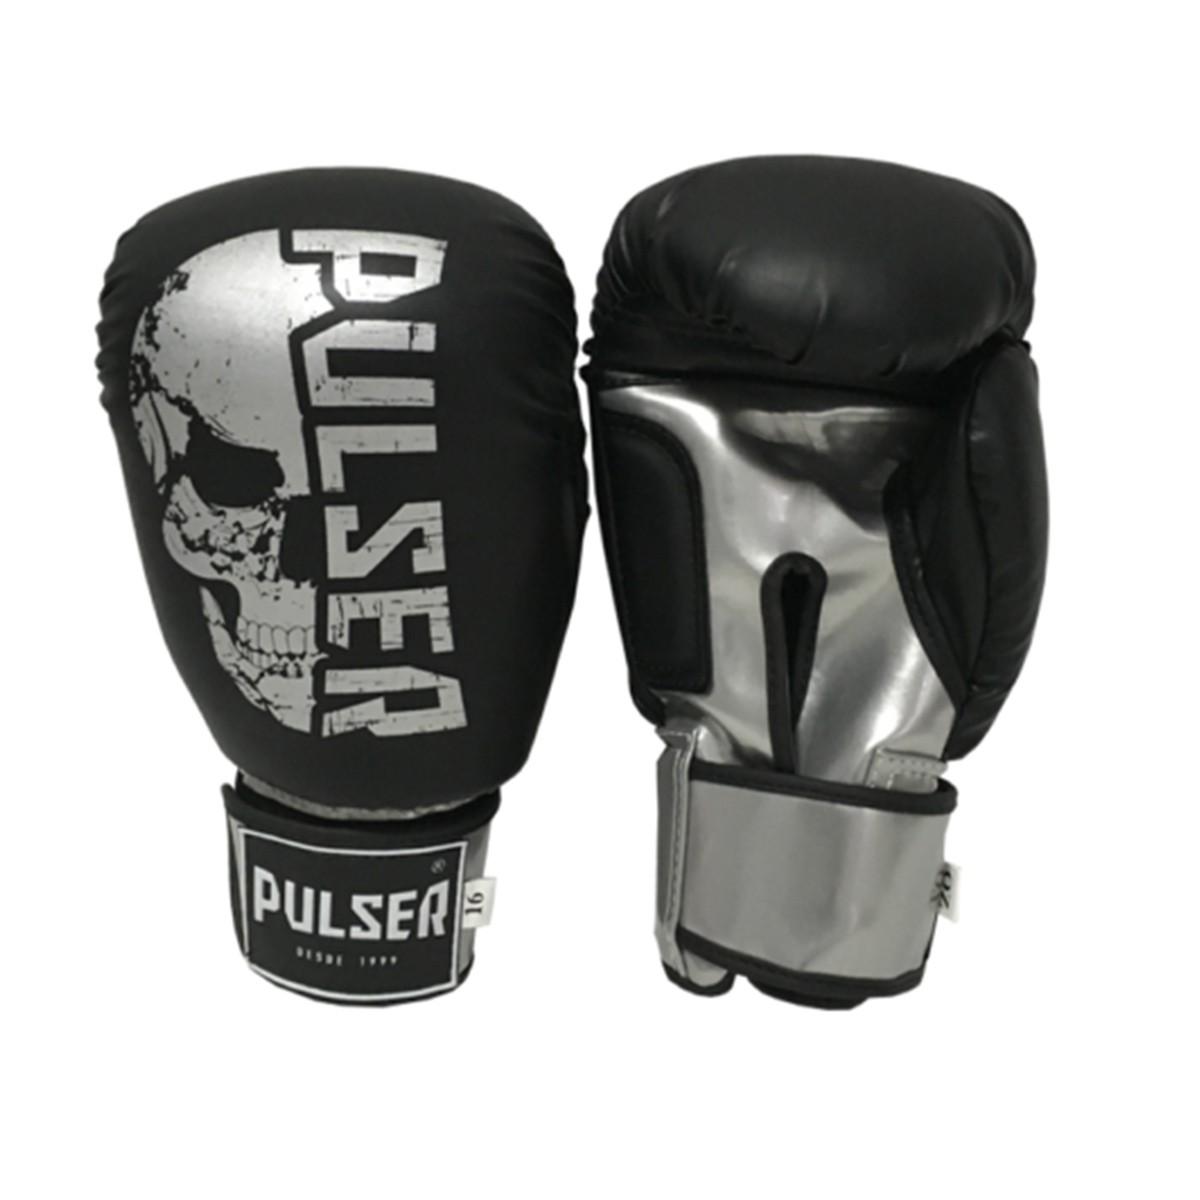 Kit de Boxe / Muay Thai 16oz - Preto Caveira - Pulser  - PRALUTA SHOP